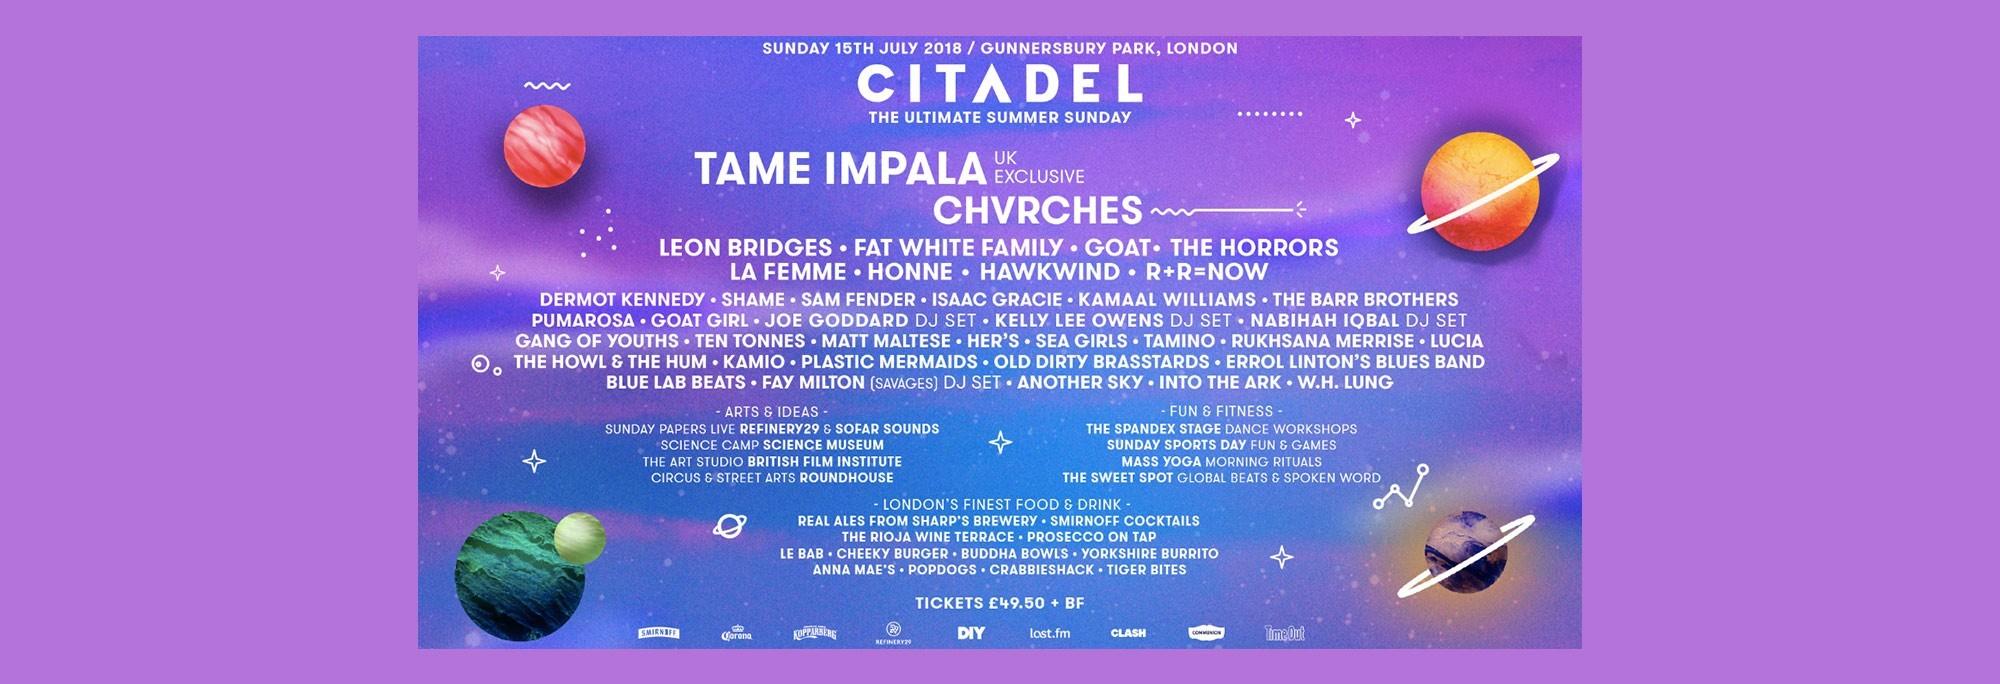 Citadel - Gunnersbury Park, London - 15th July